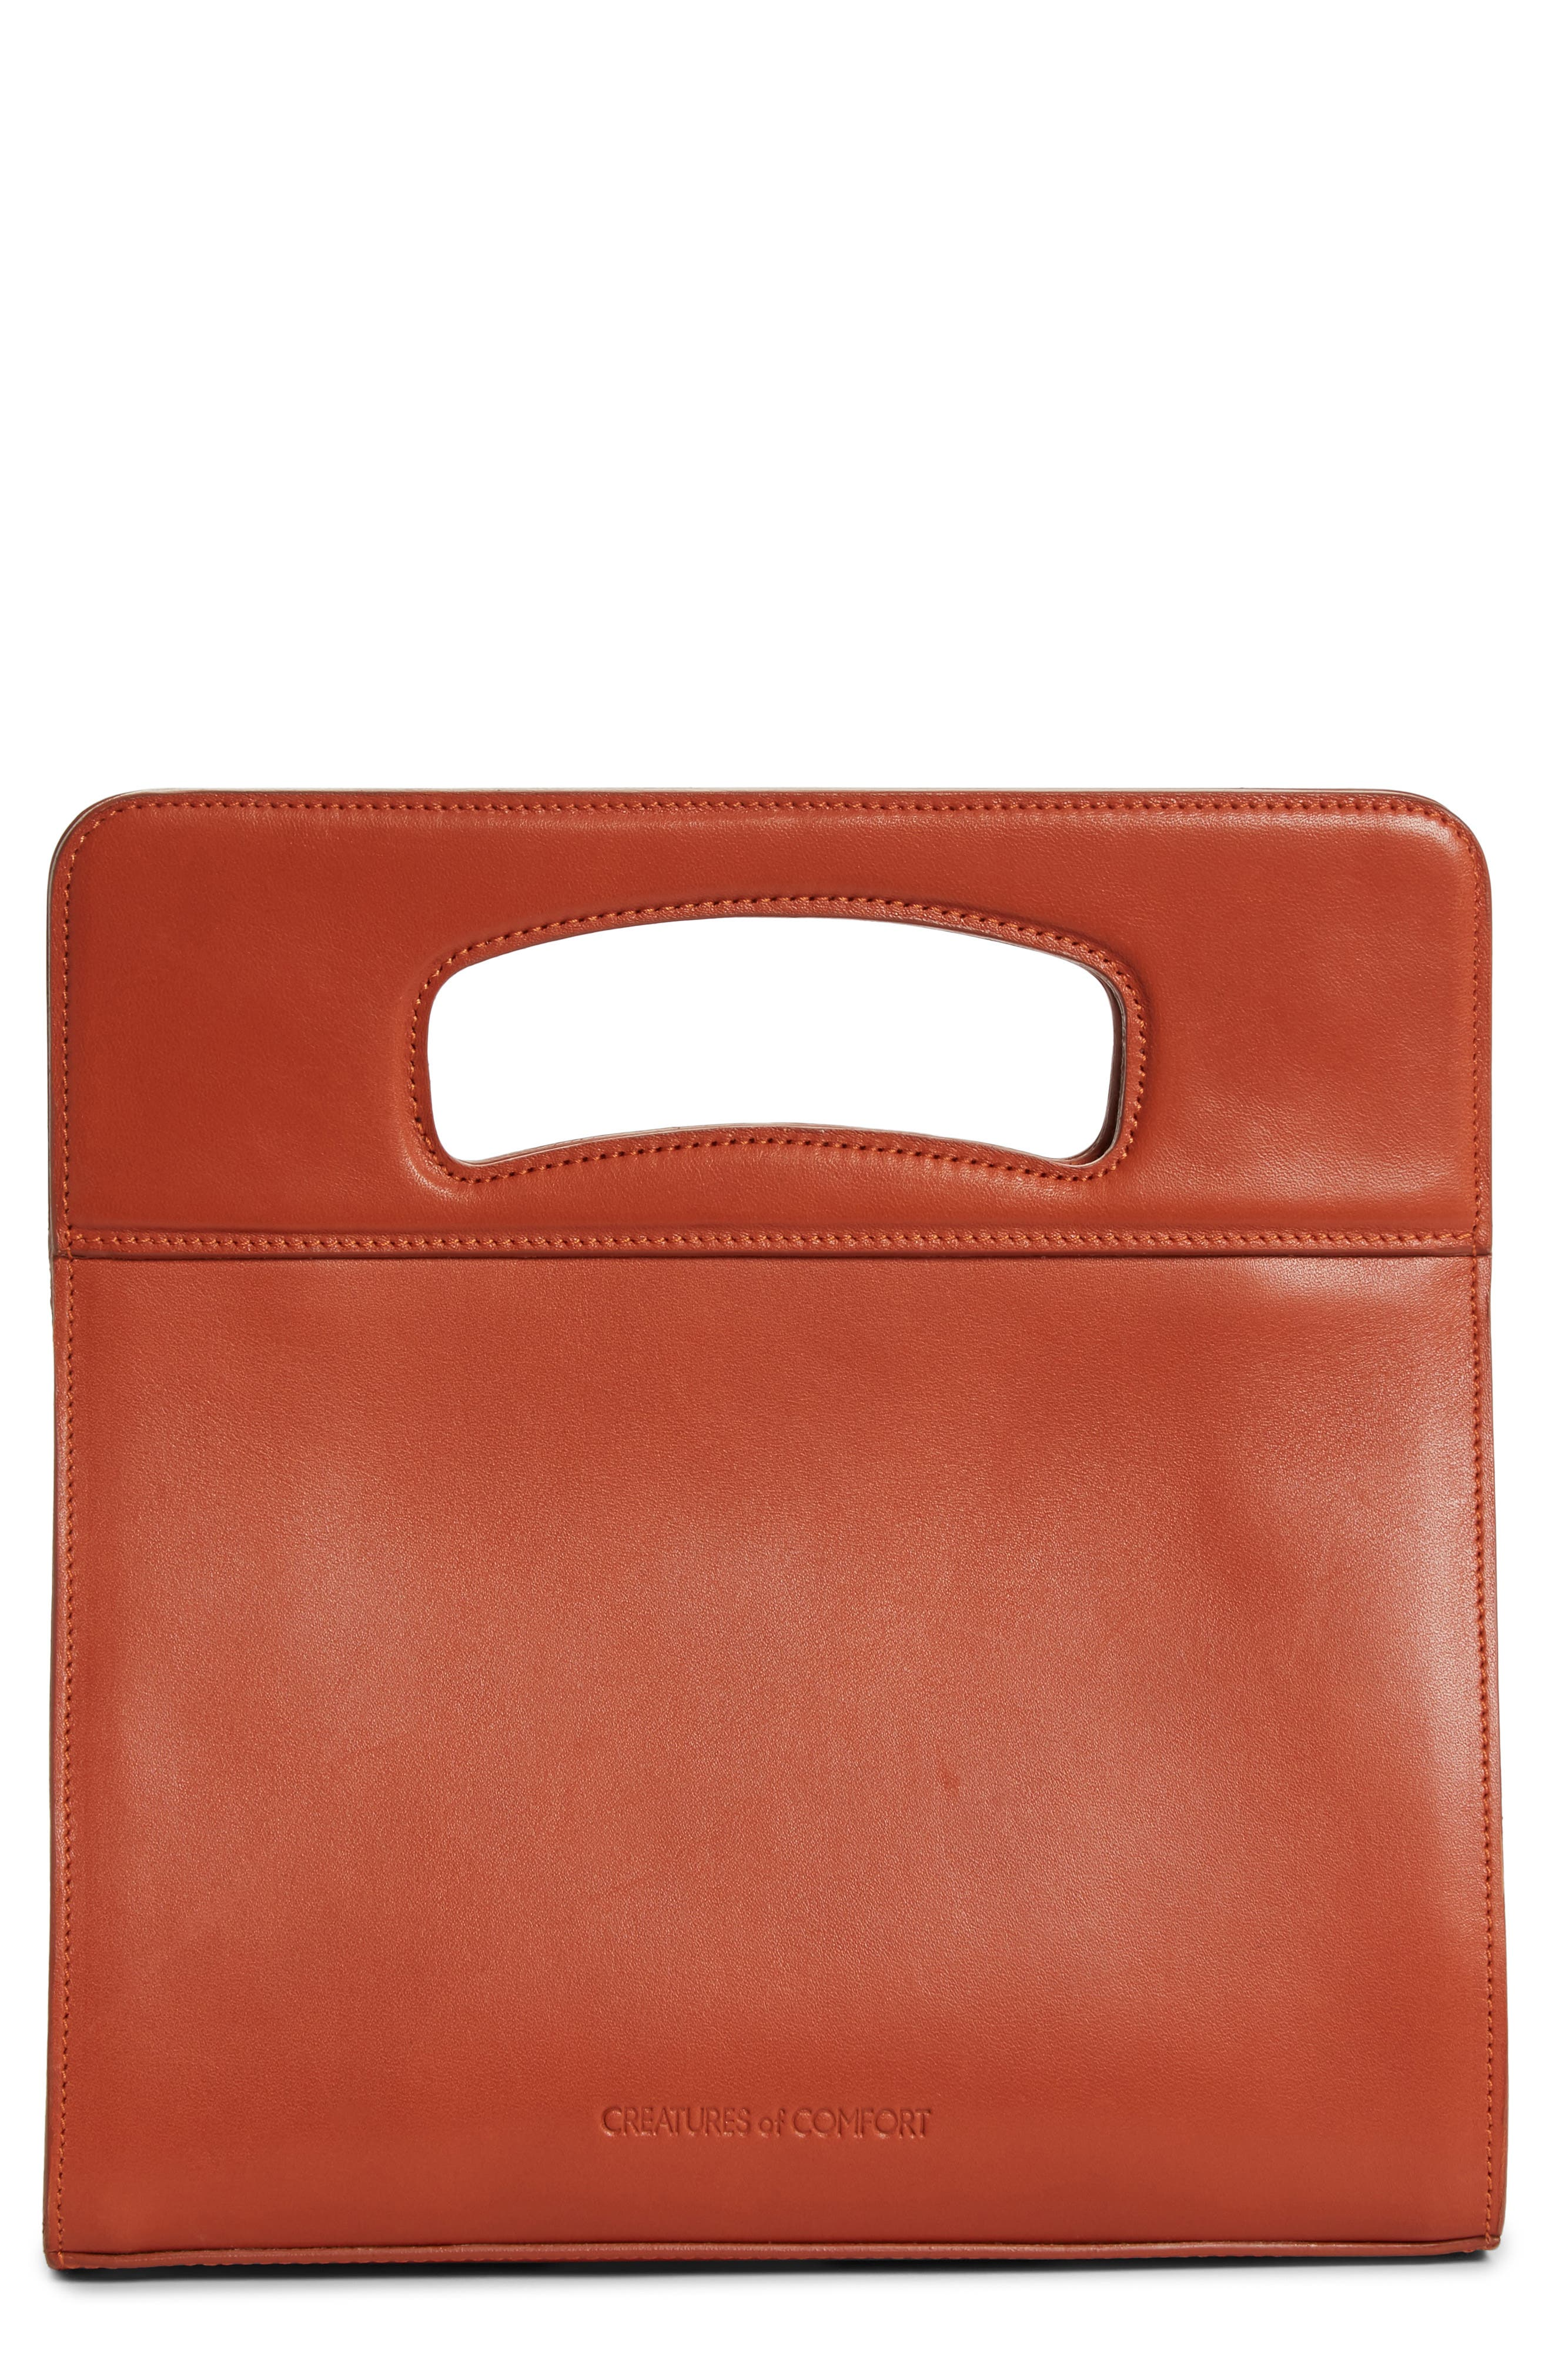 Gilda Crossbody Bag,                             Main thumbnail 1, color,                             200